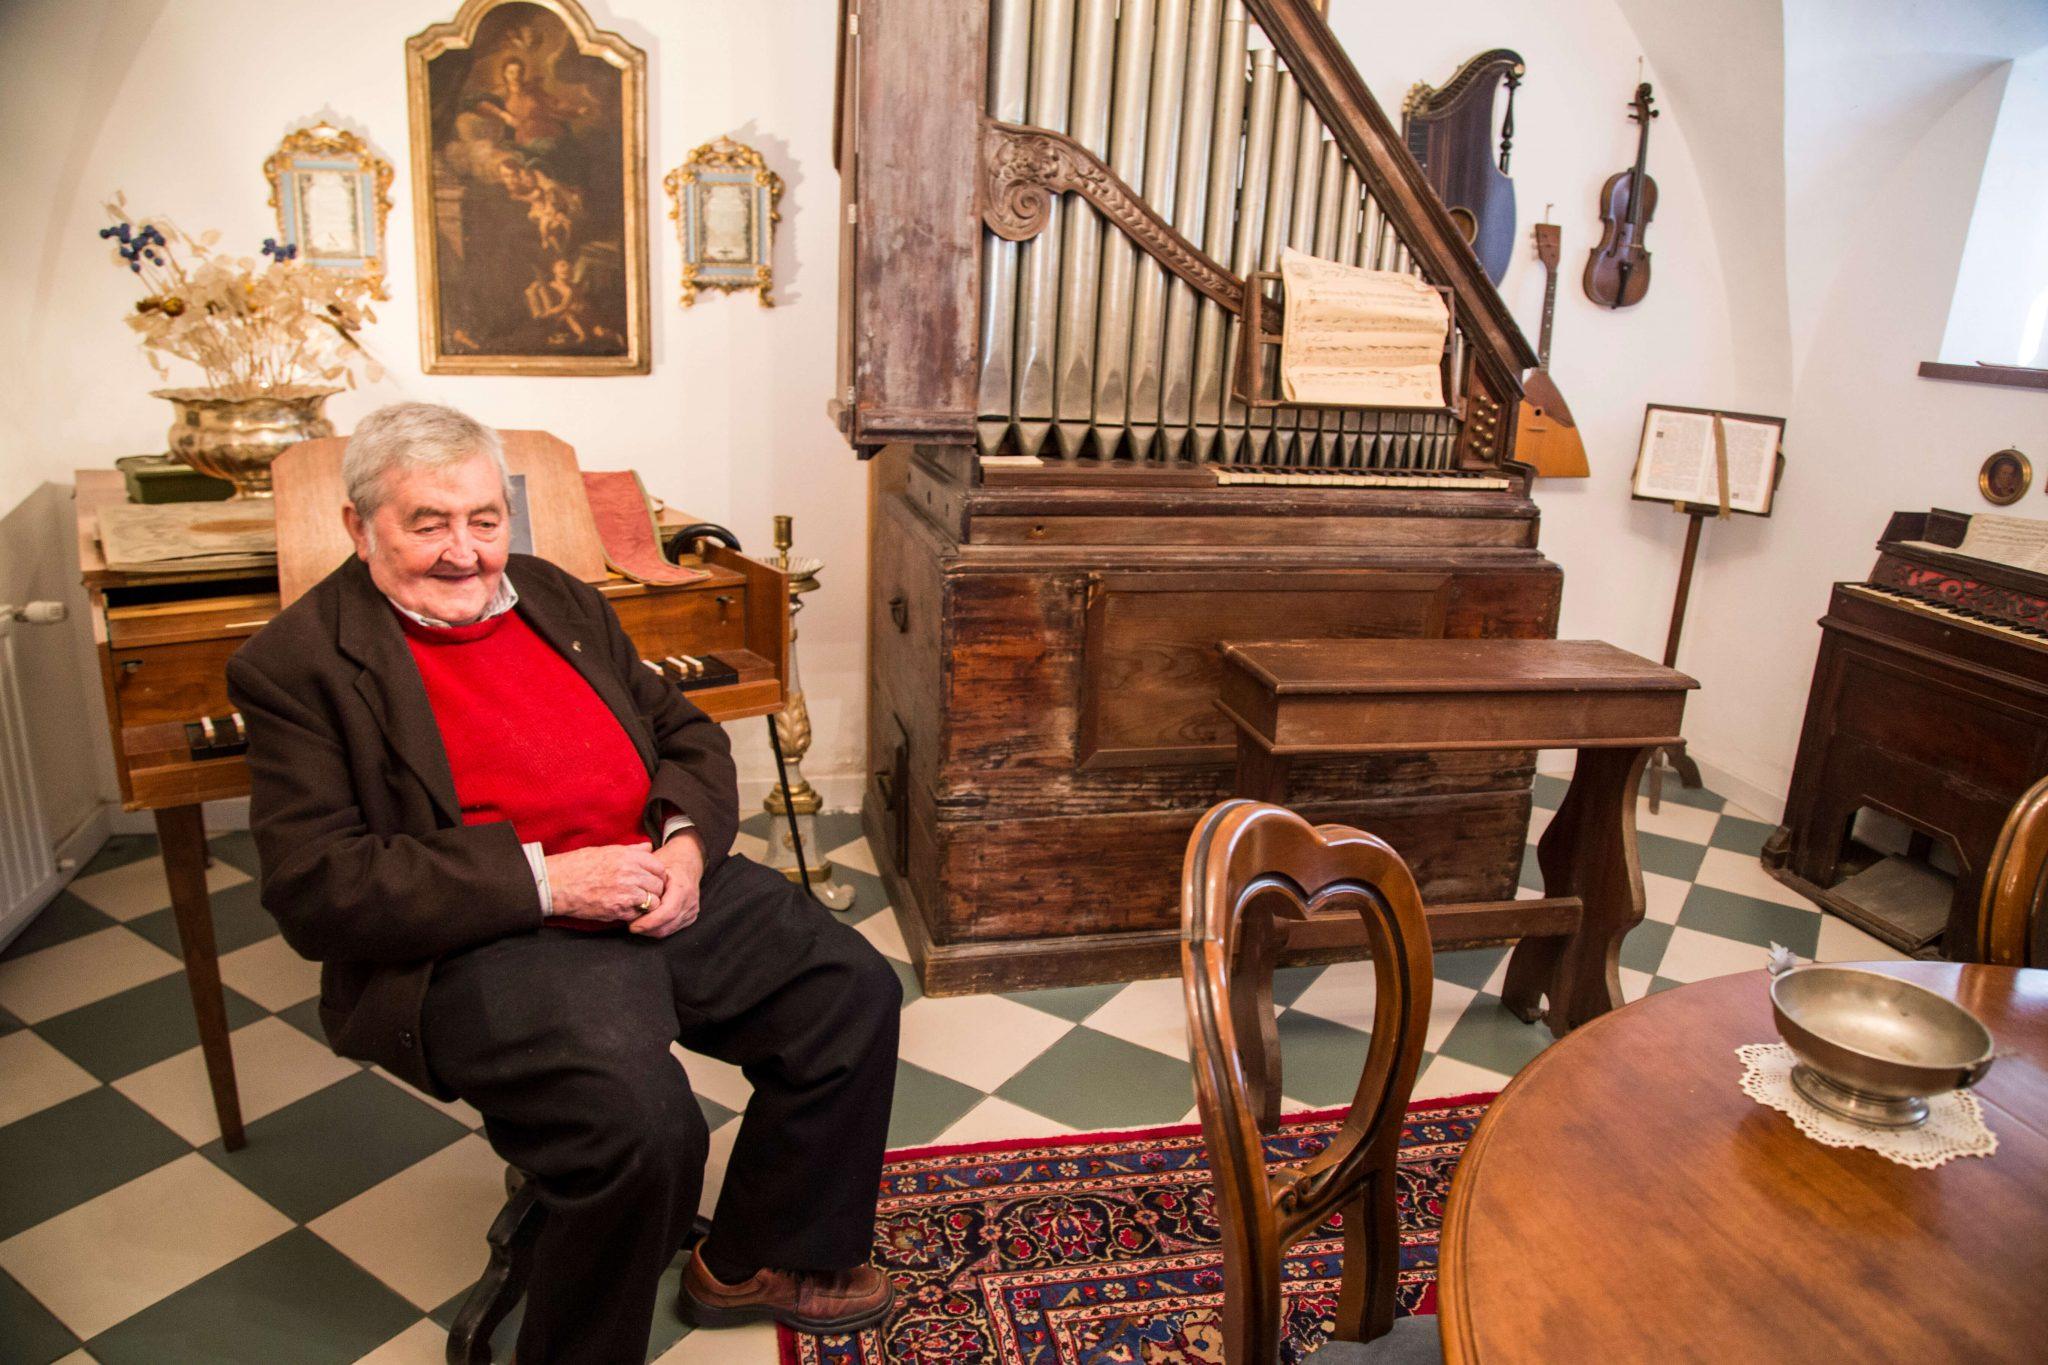 Mozartina in Paularo, Carnia, Italien, Musikmuseum, Foto Anita Arneitz und Matthias Eichinger, Reiseblog www.anitaaufreisen.at